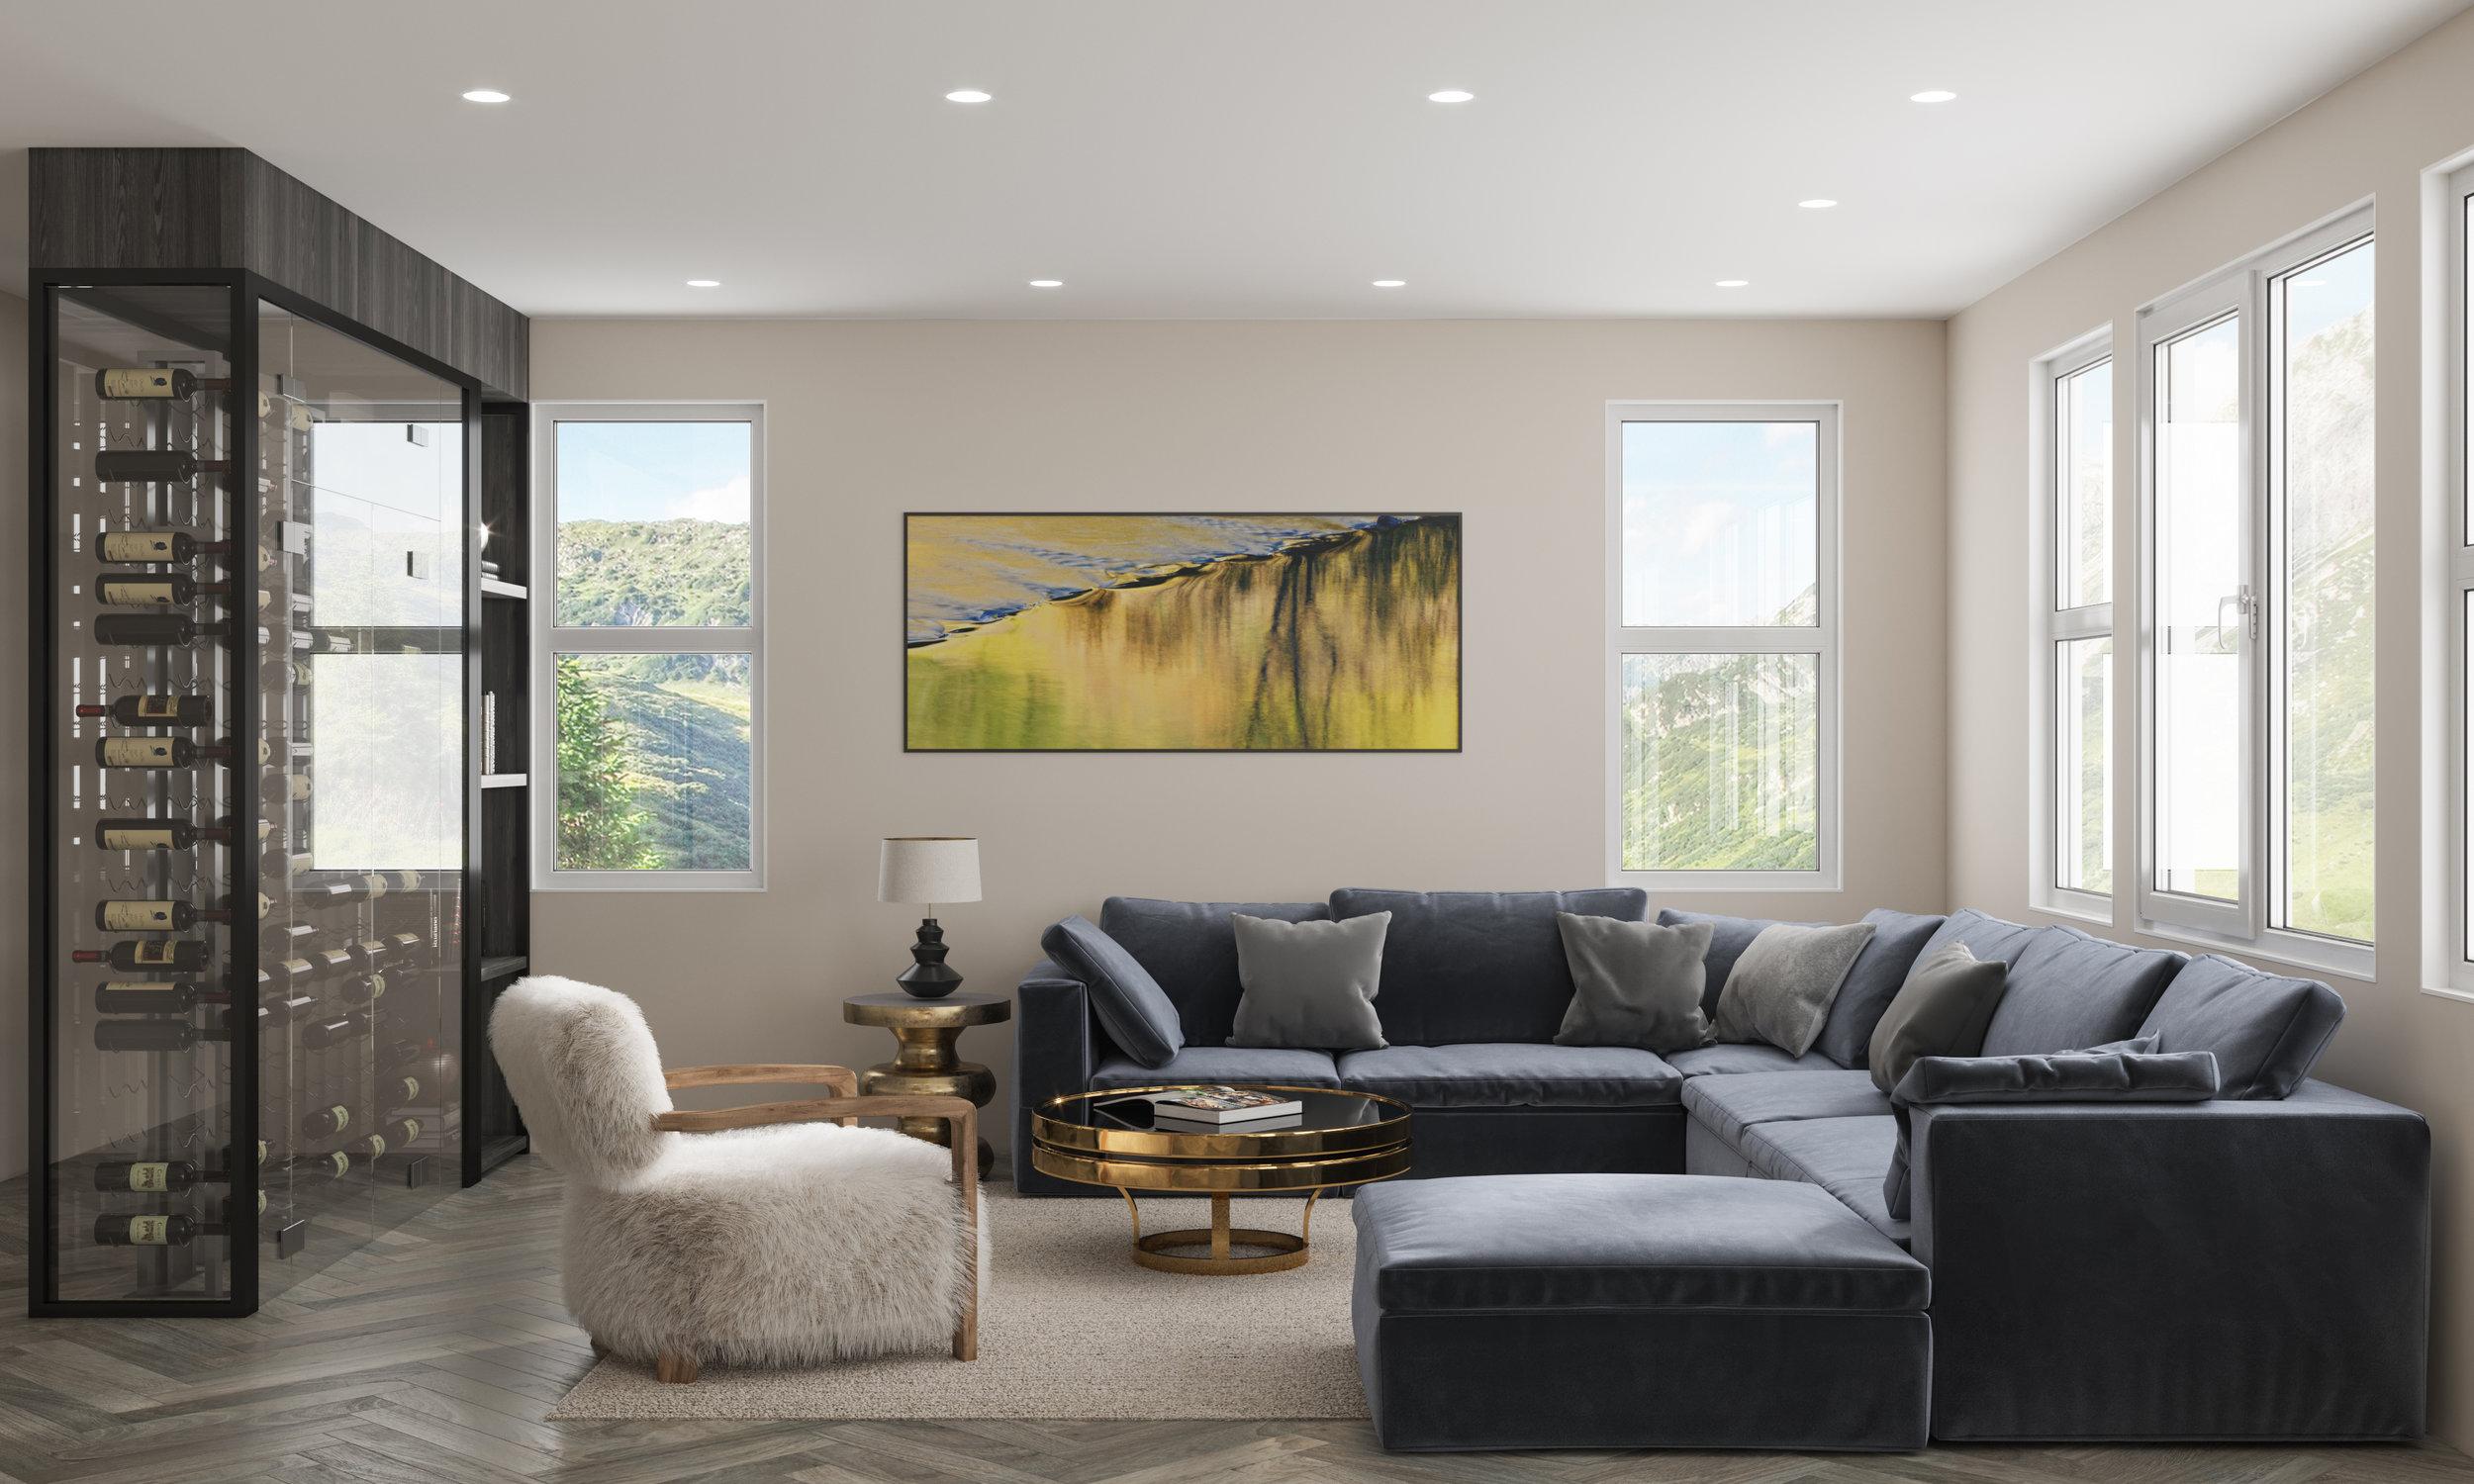 Lawler-familyroom-26.08.2019.jpg